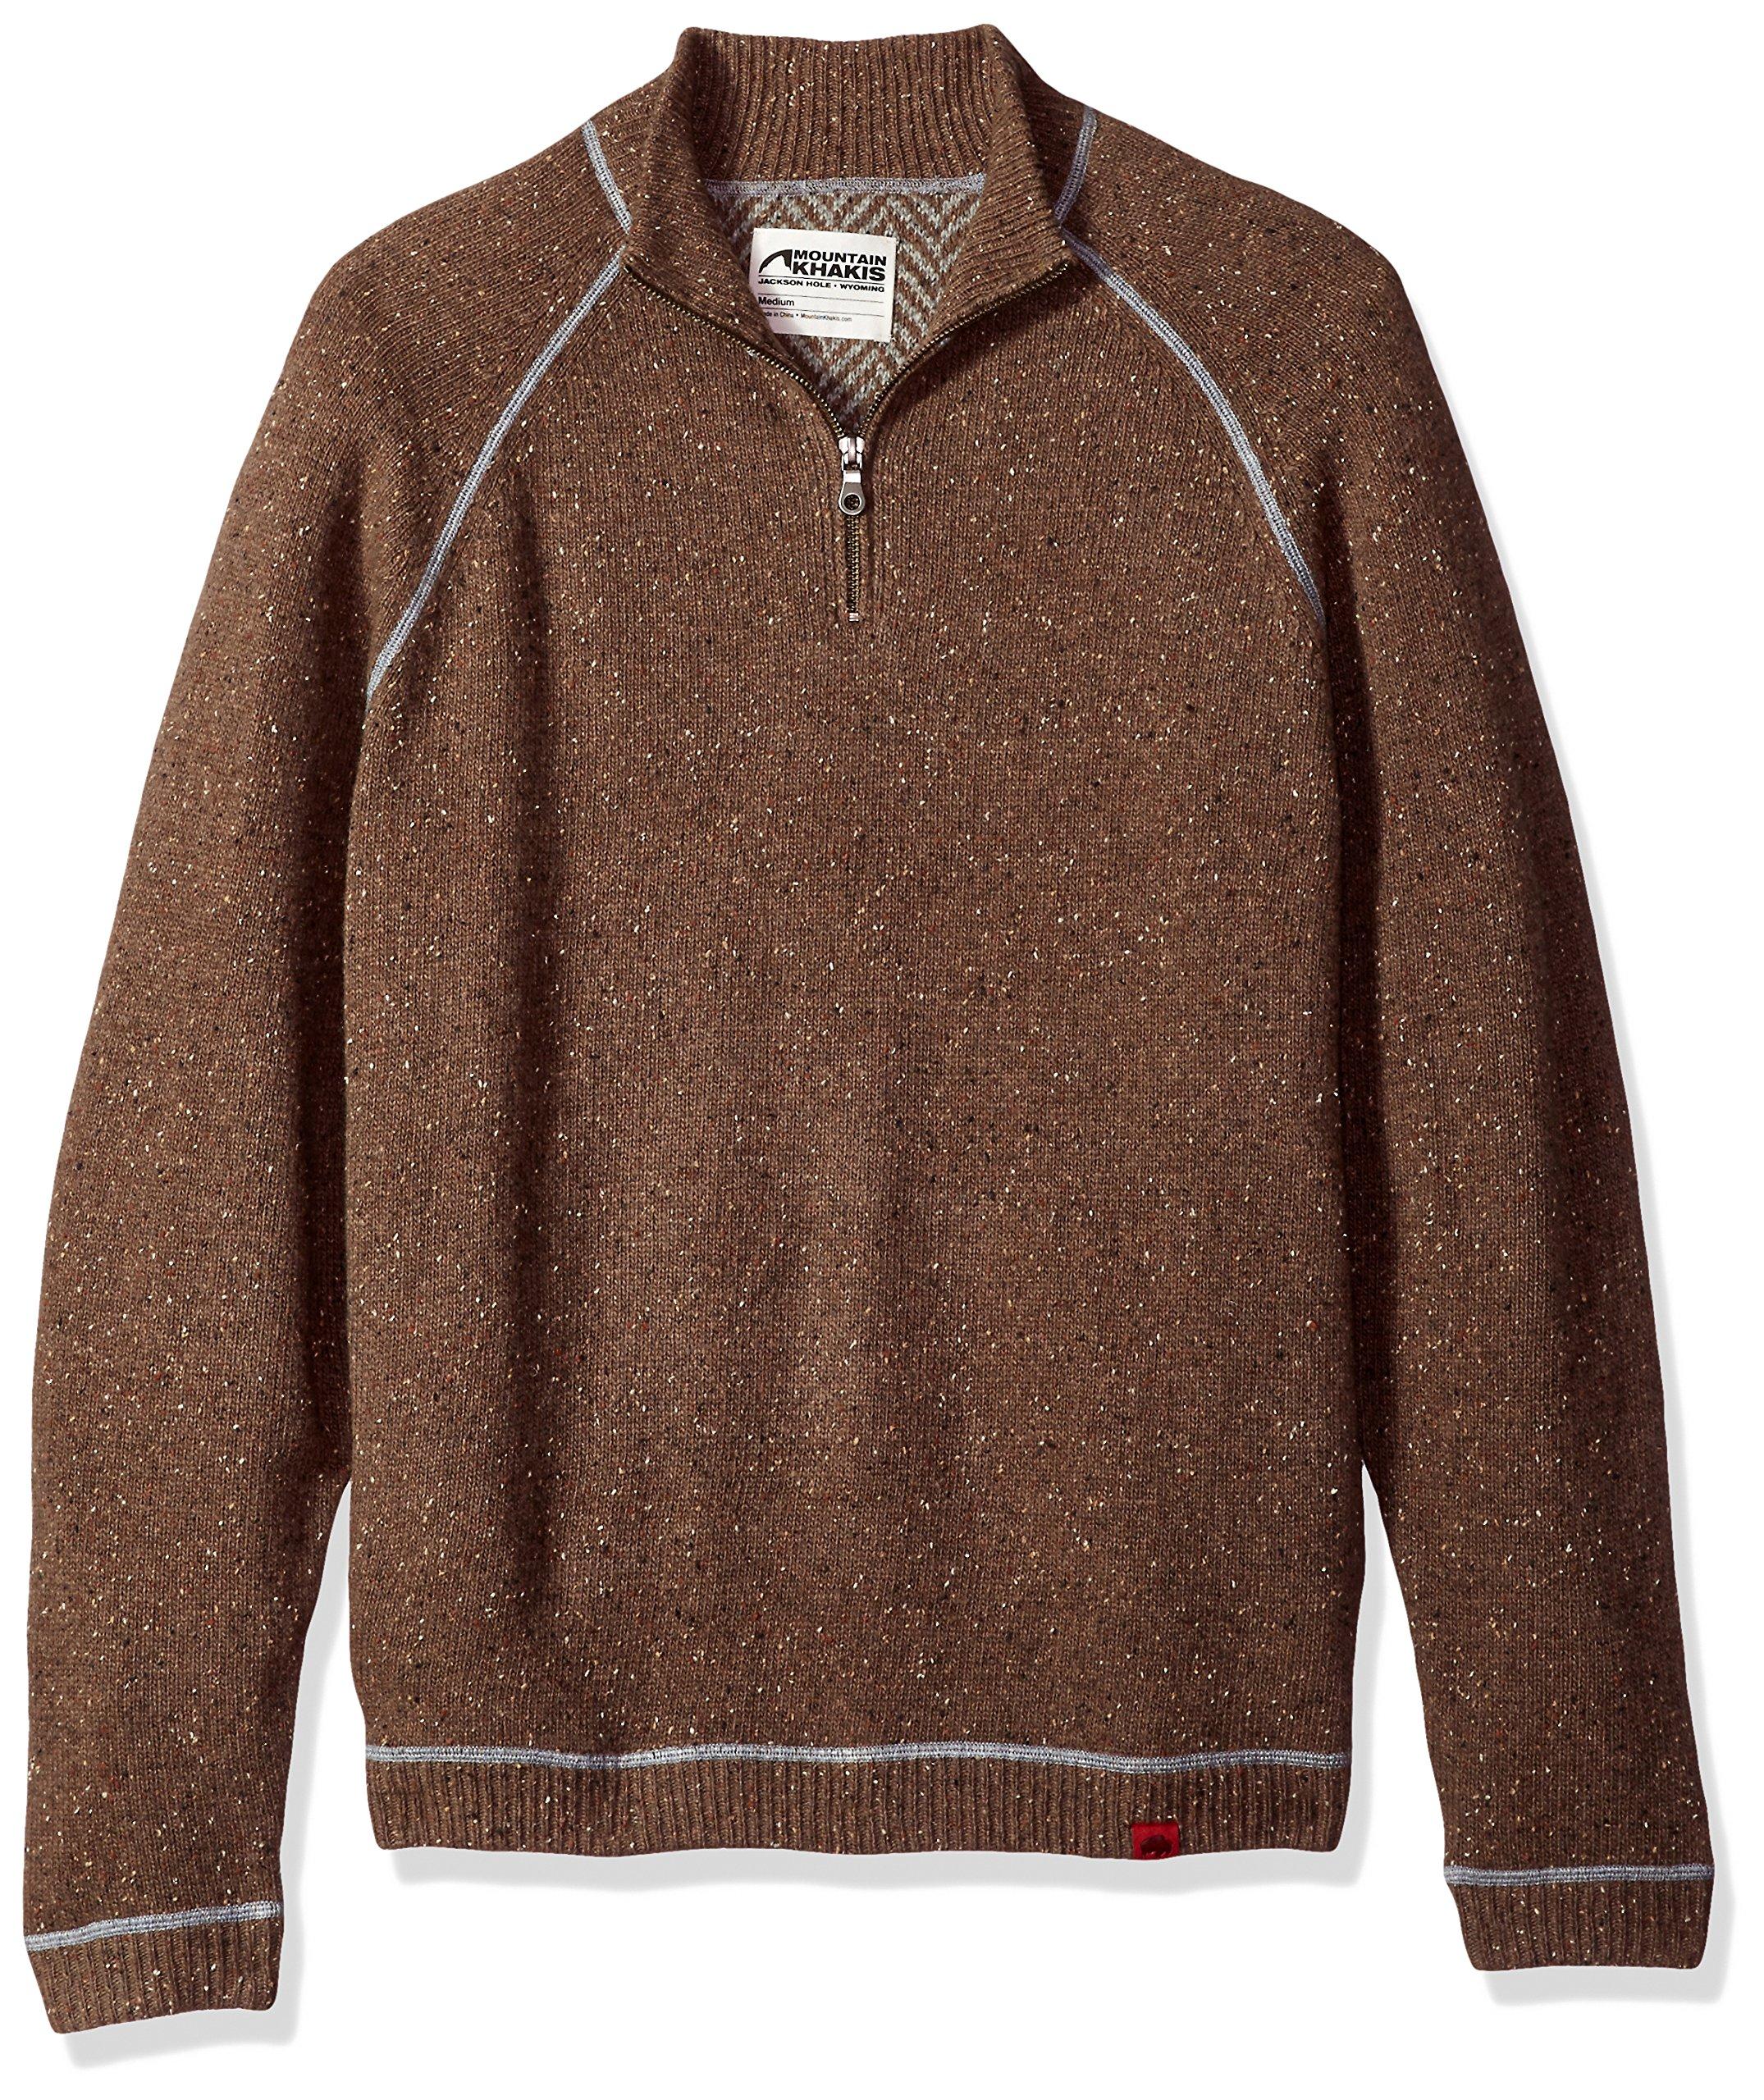 Mountain Khakis Men's Fleck Qtr Zip Sweater, Terra, X-Large